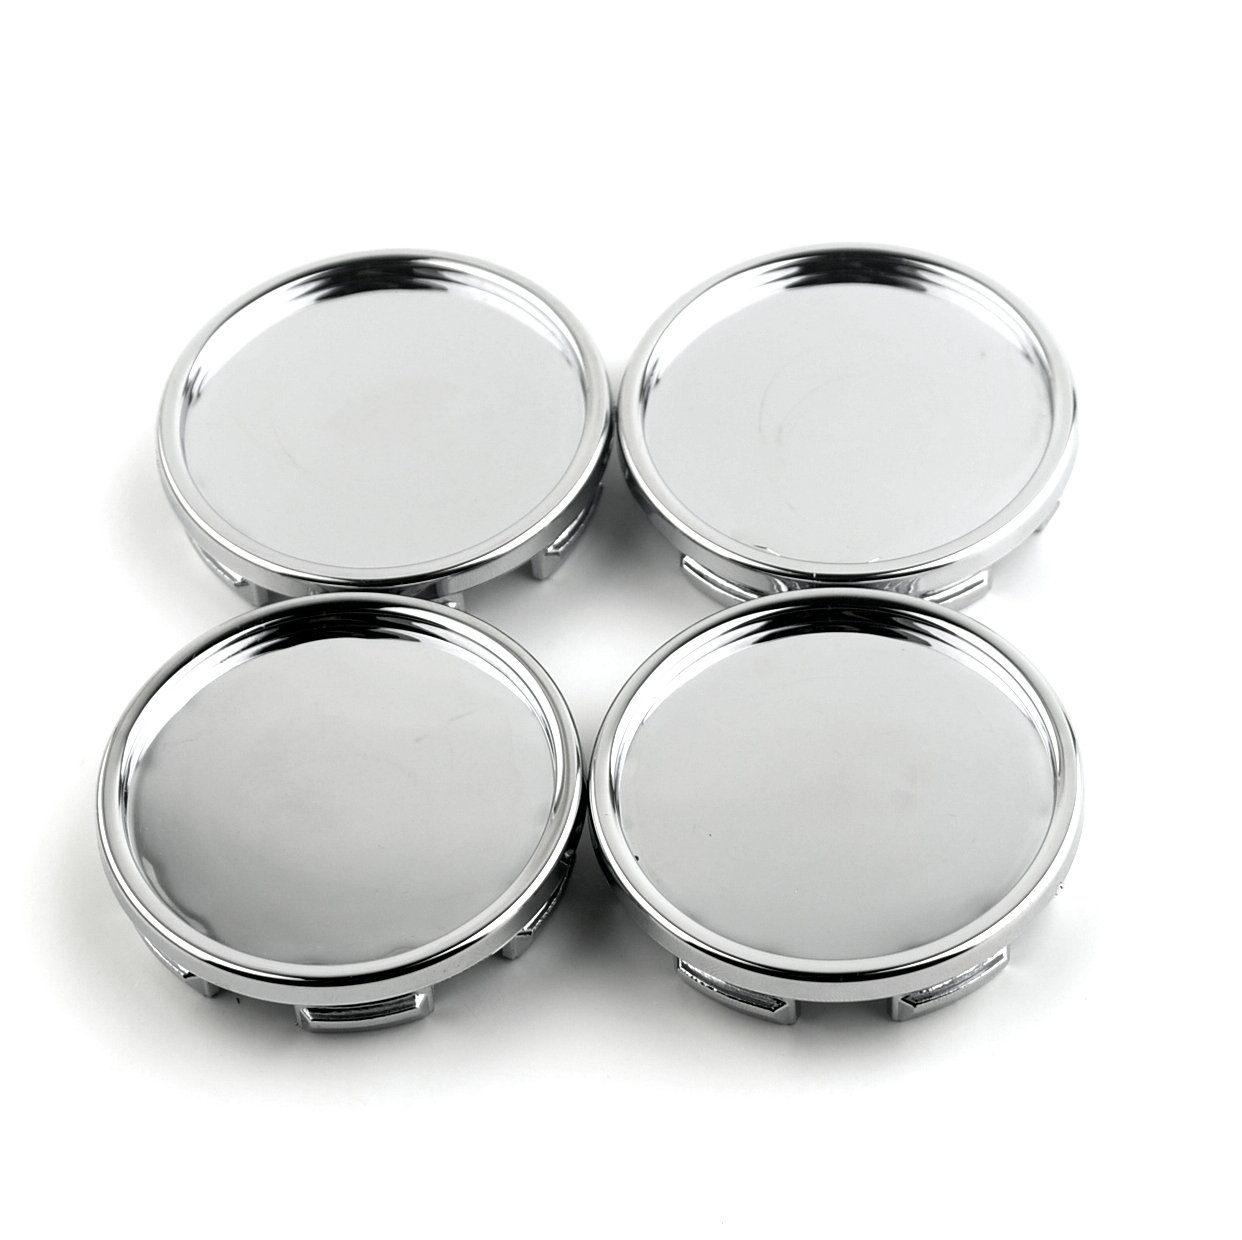 58mm Chrome Silver ABS Car Wheel Center Hub Caps Base Set of 4